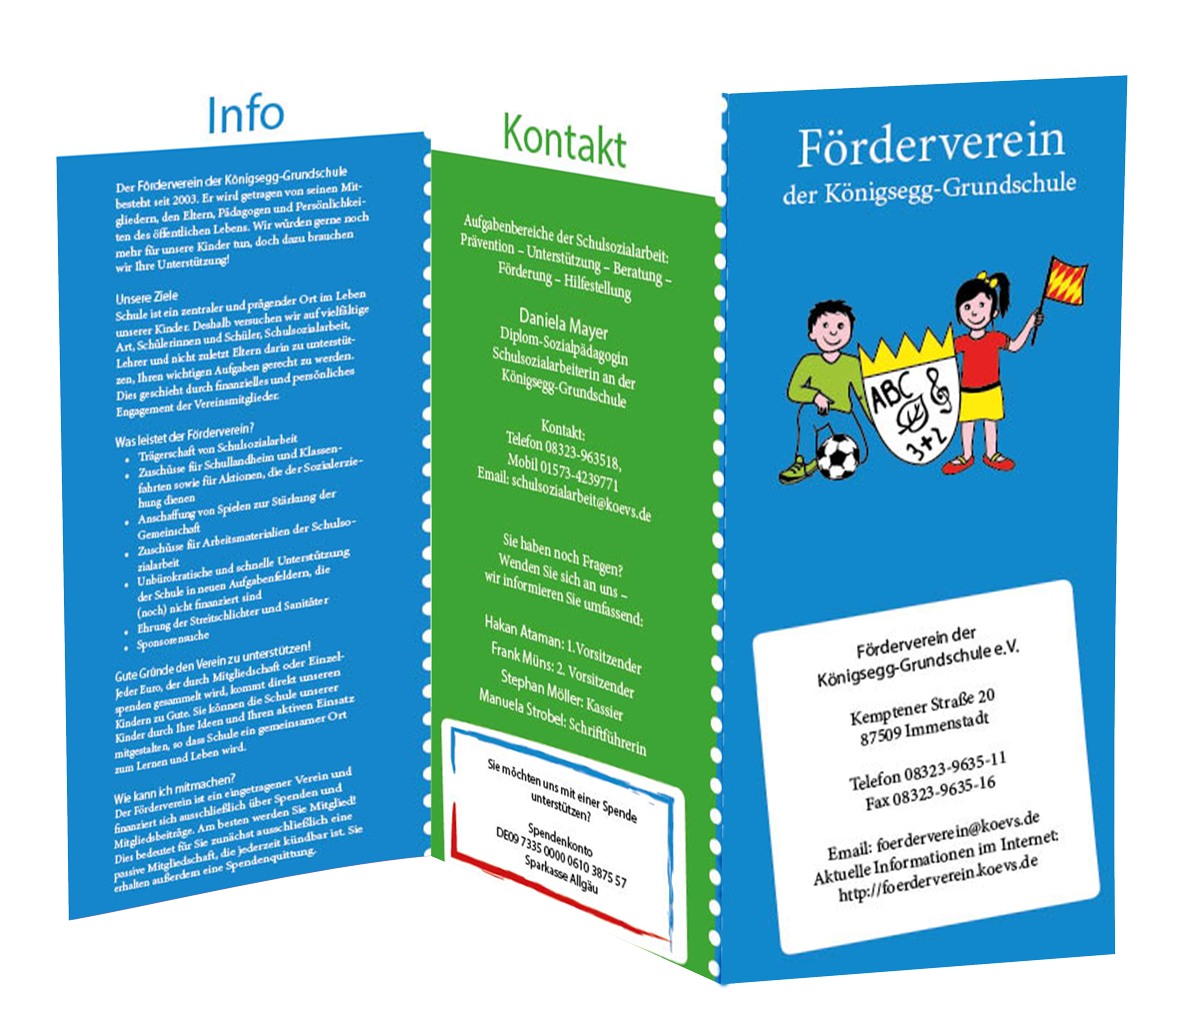 Muenswebit Förderverein Königsegg Grundschule Immenstadt Grafikdesign